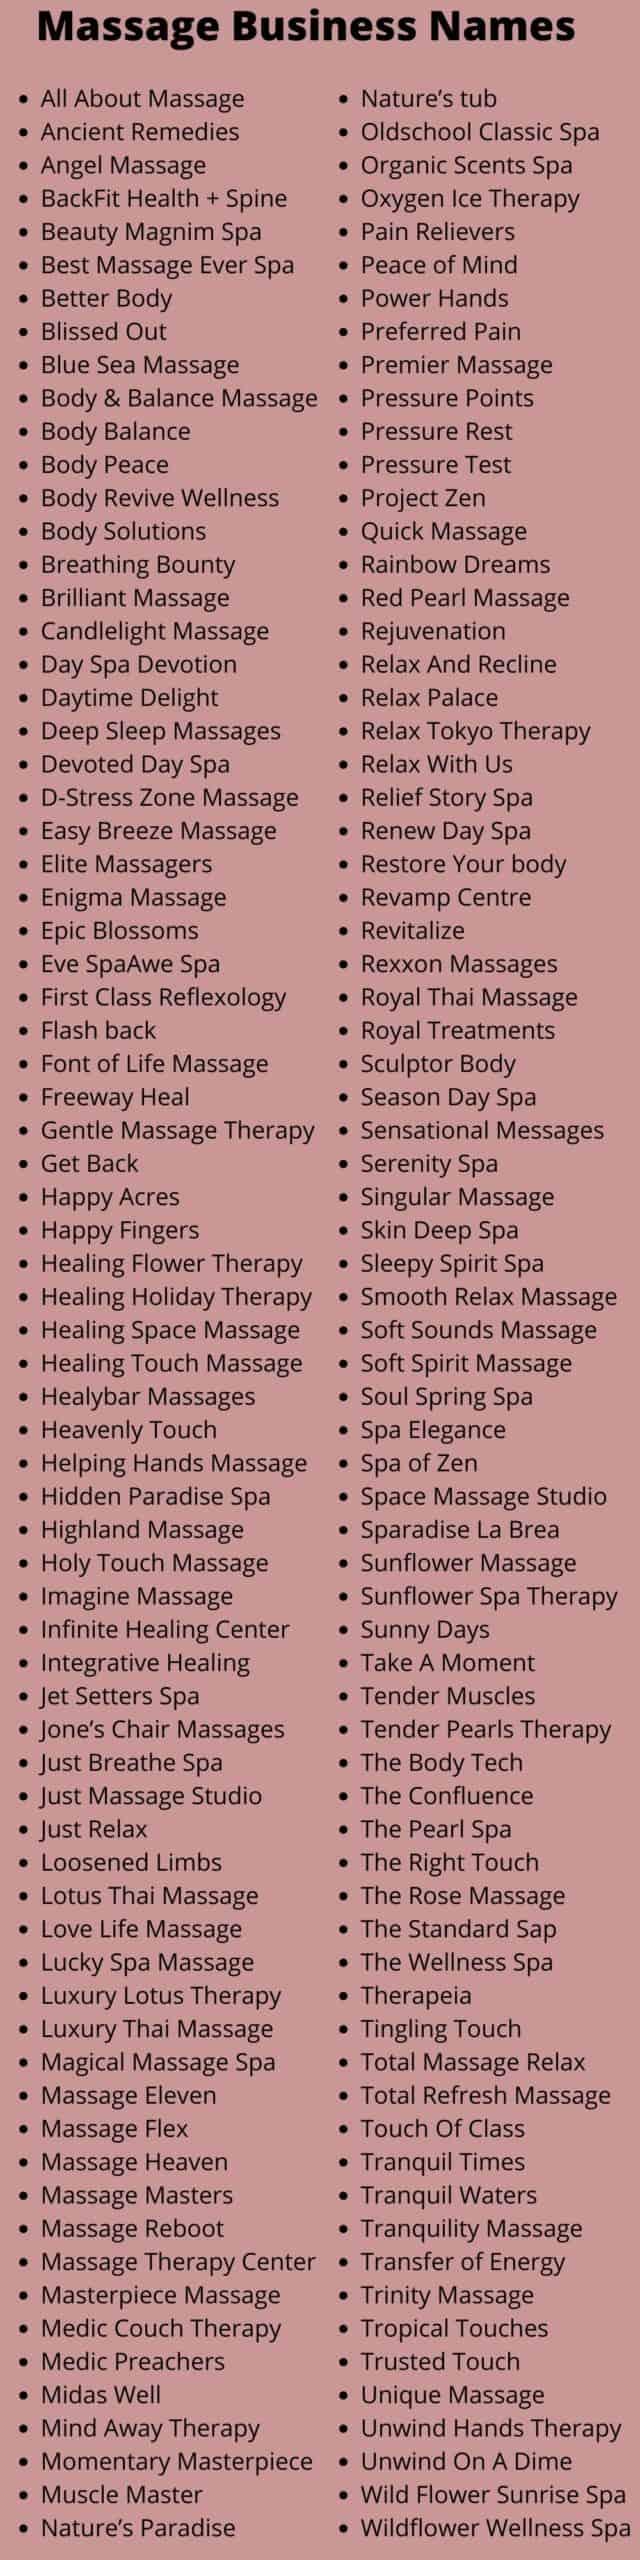 Massage Business Names